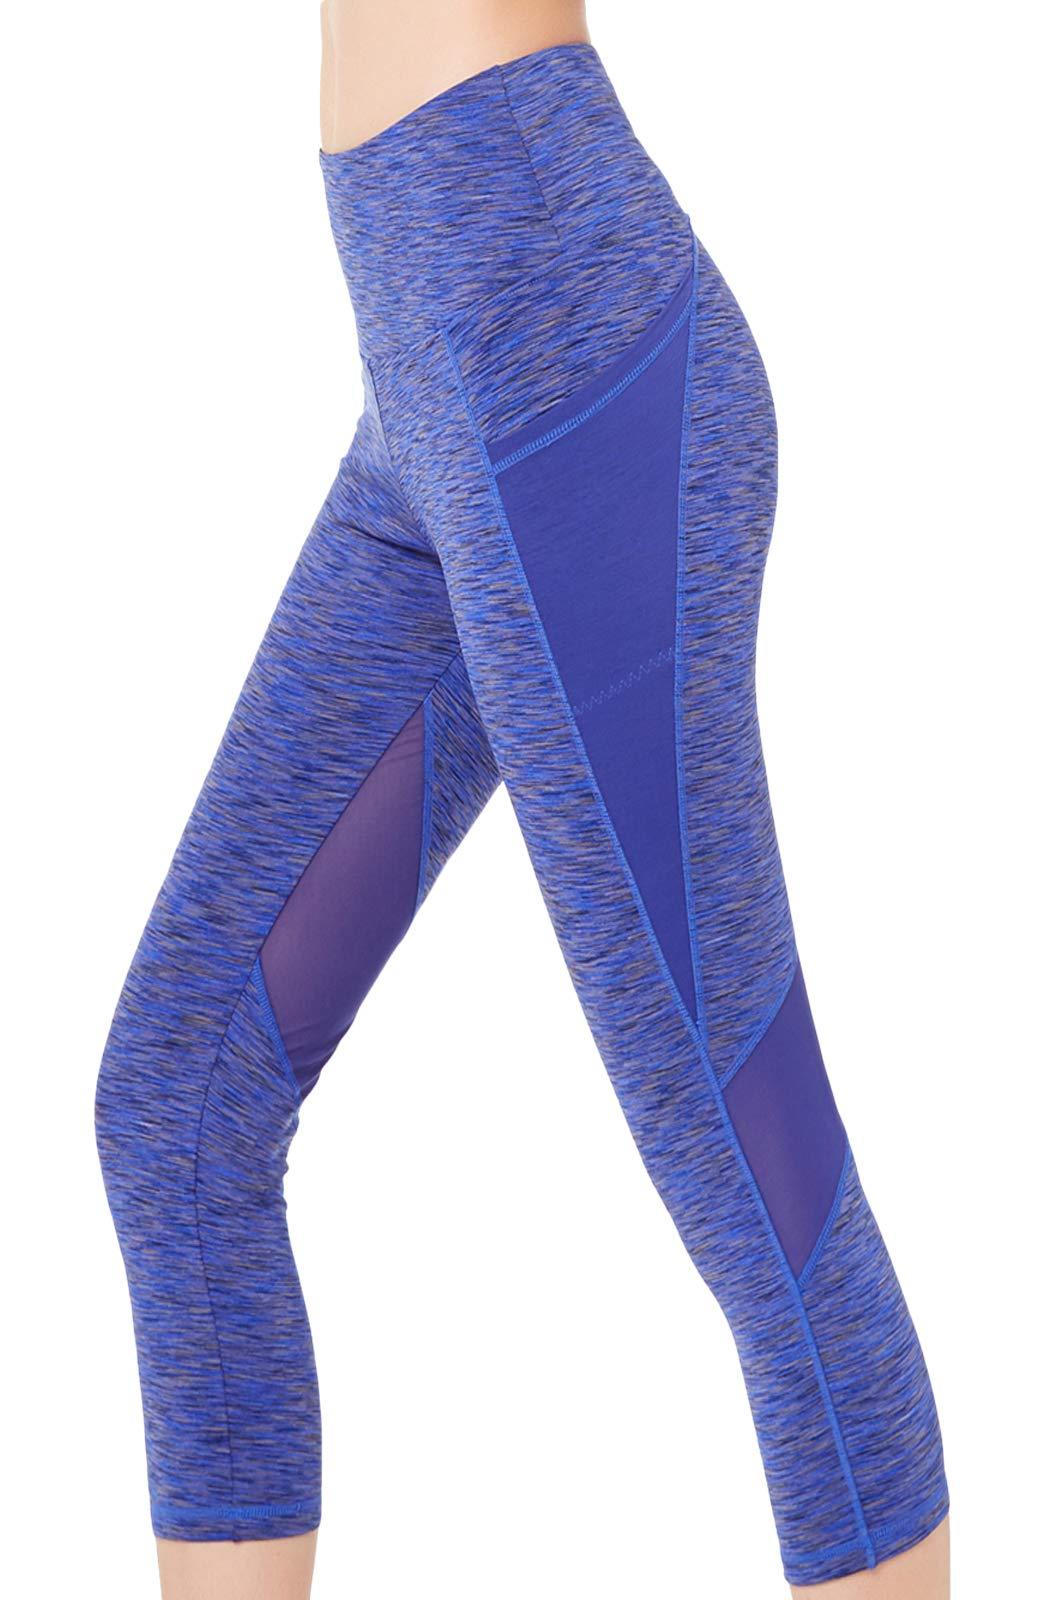 Picotee Women's Long Yoga Pants High Waist Workout Capri Leggings Running Active Tights w Side Pocket (Capri Leggings-Blue Mesh, L)